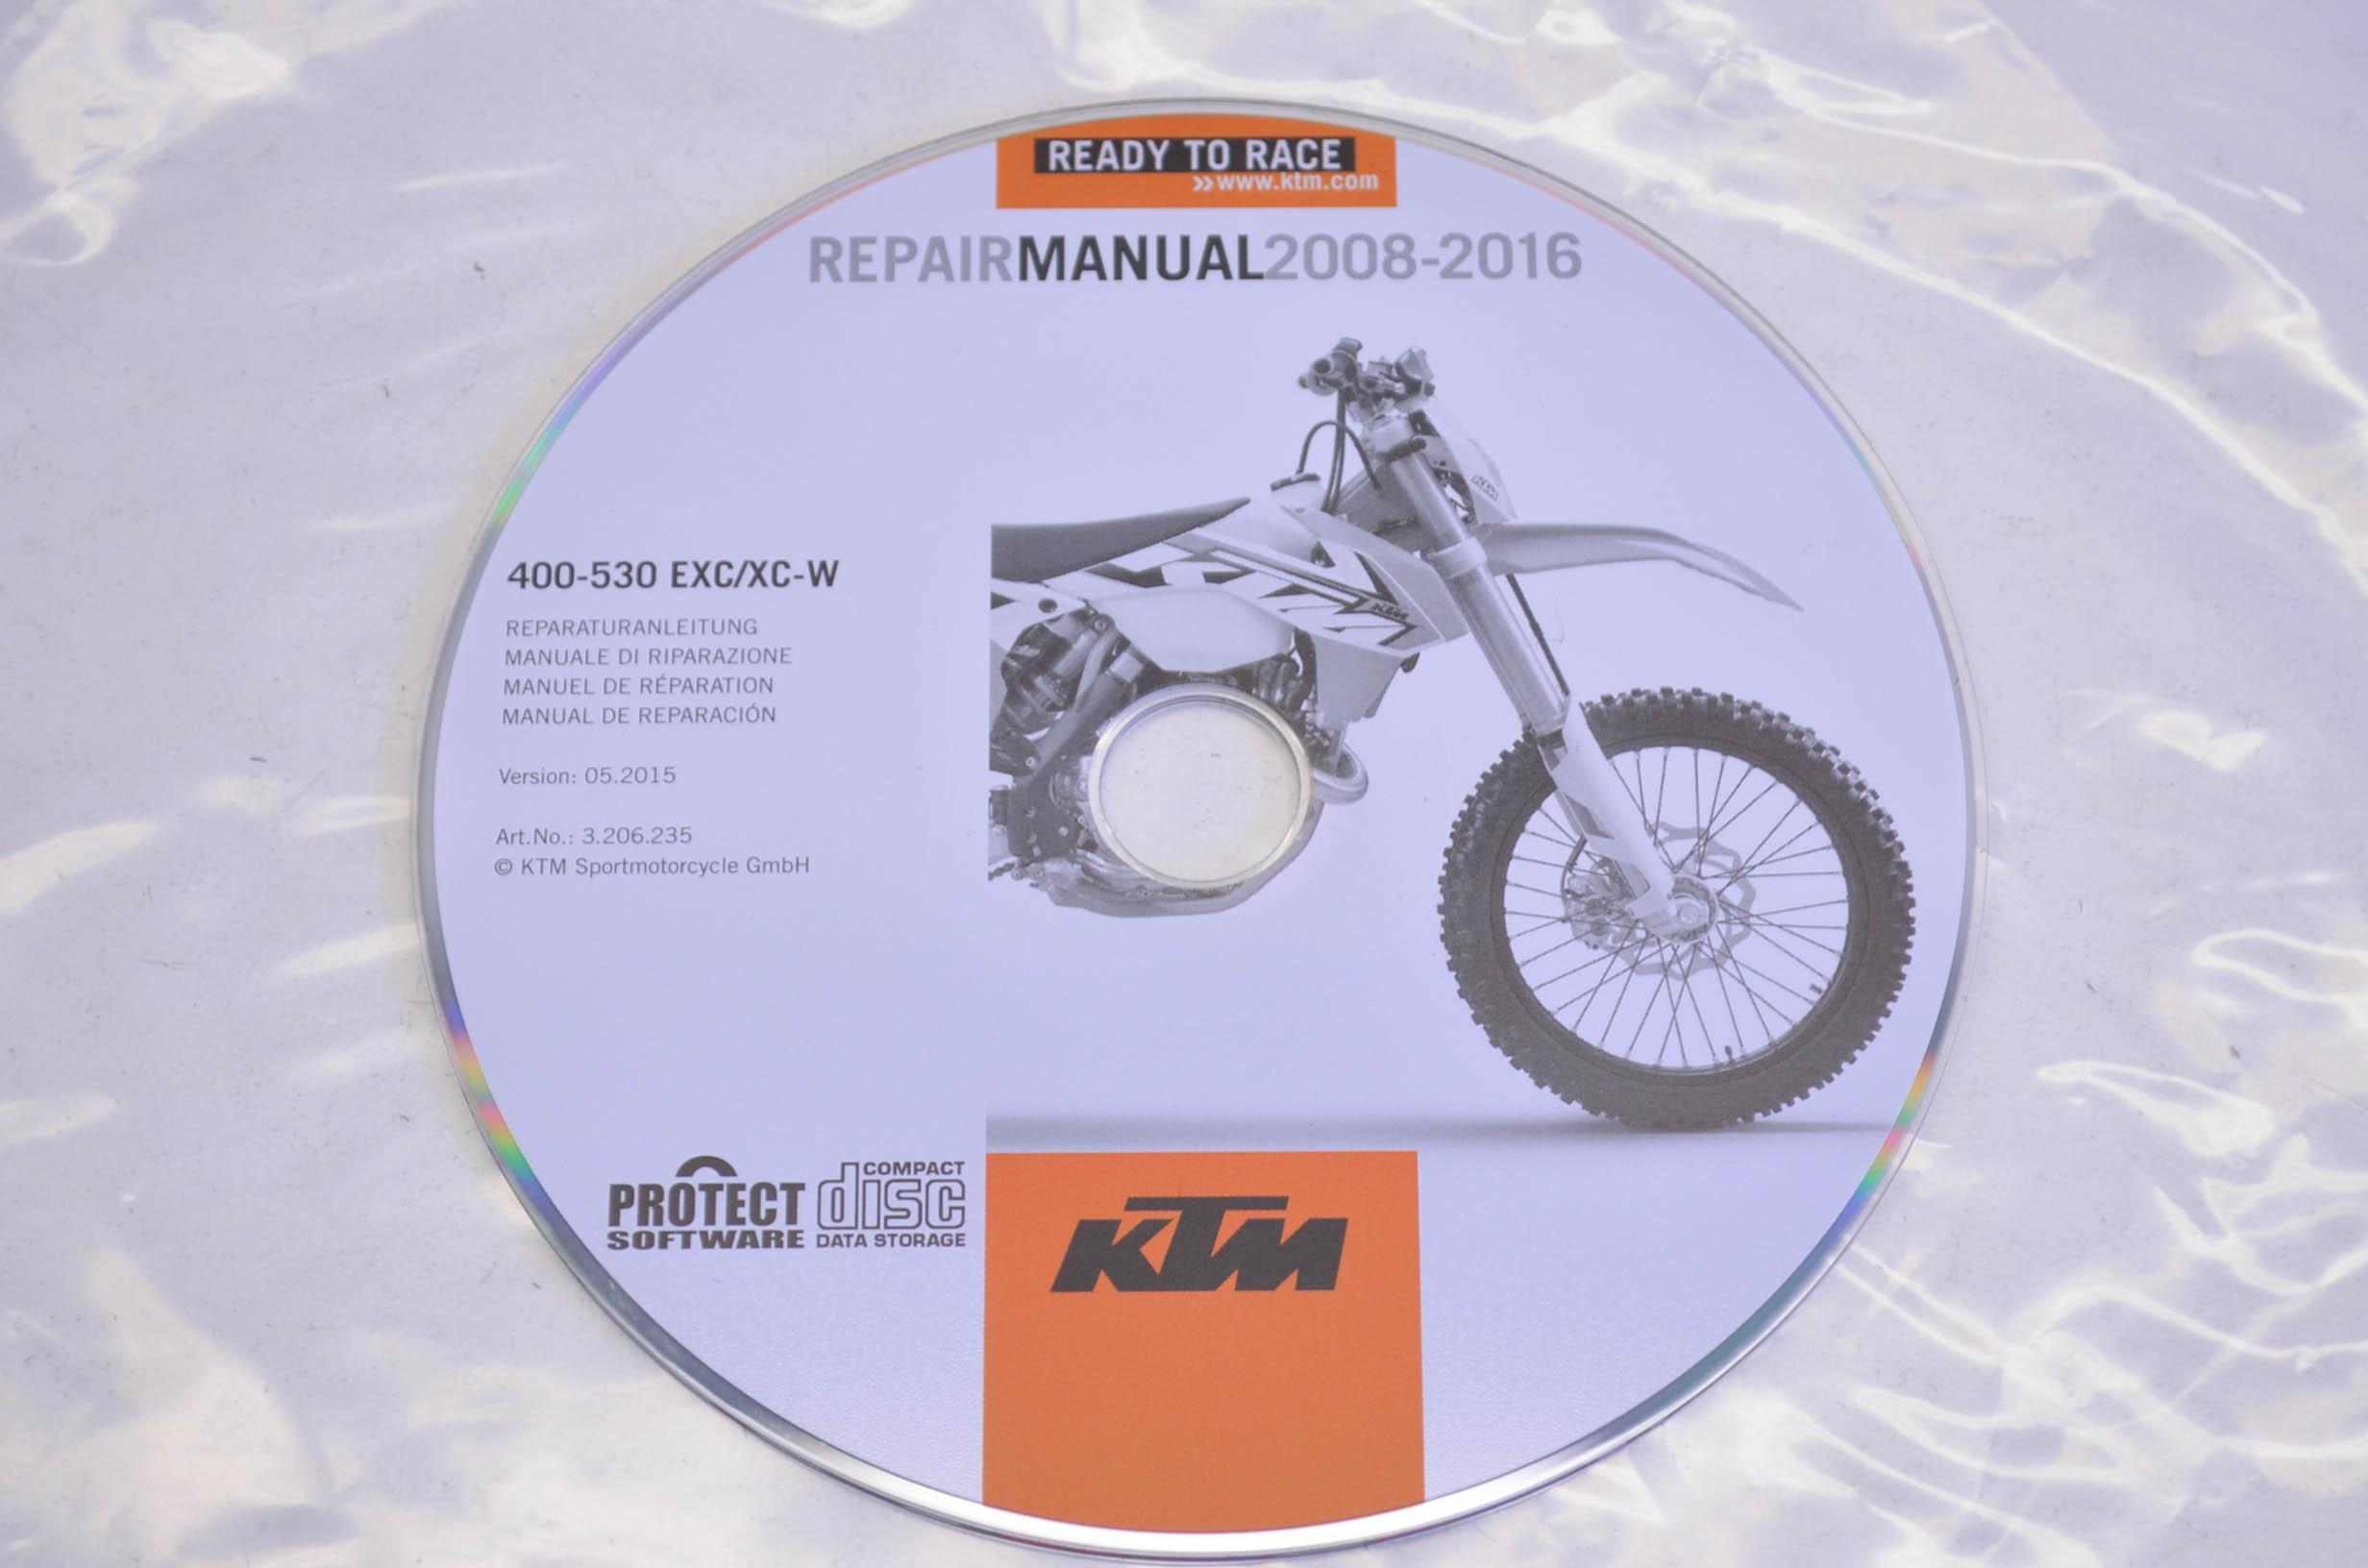 GENUINE KTM CD REPAIR MANUAL  2008-2013   400-530 EXC//XC-W  #3206152